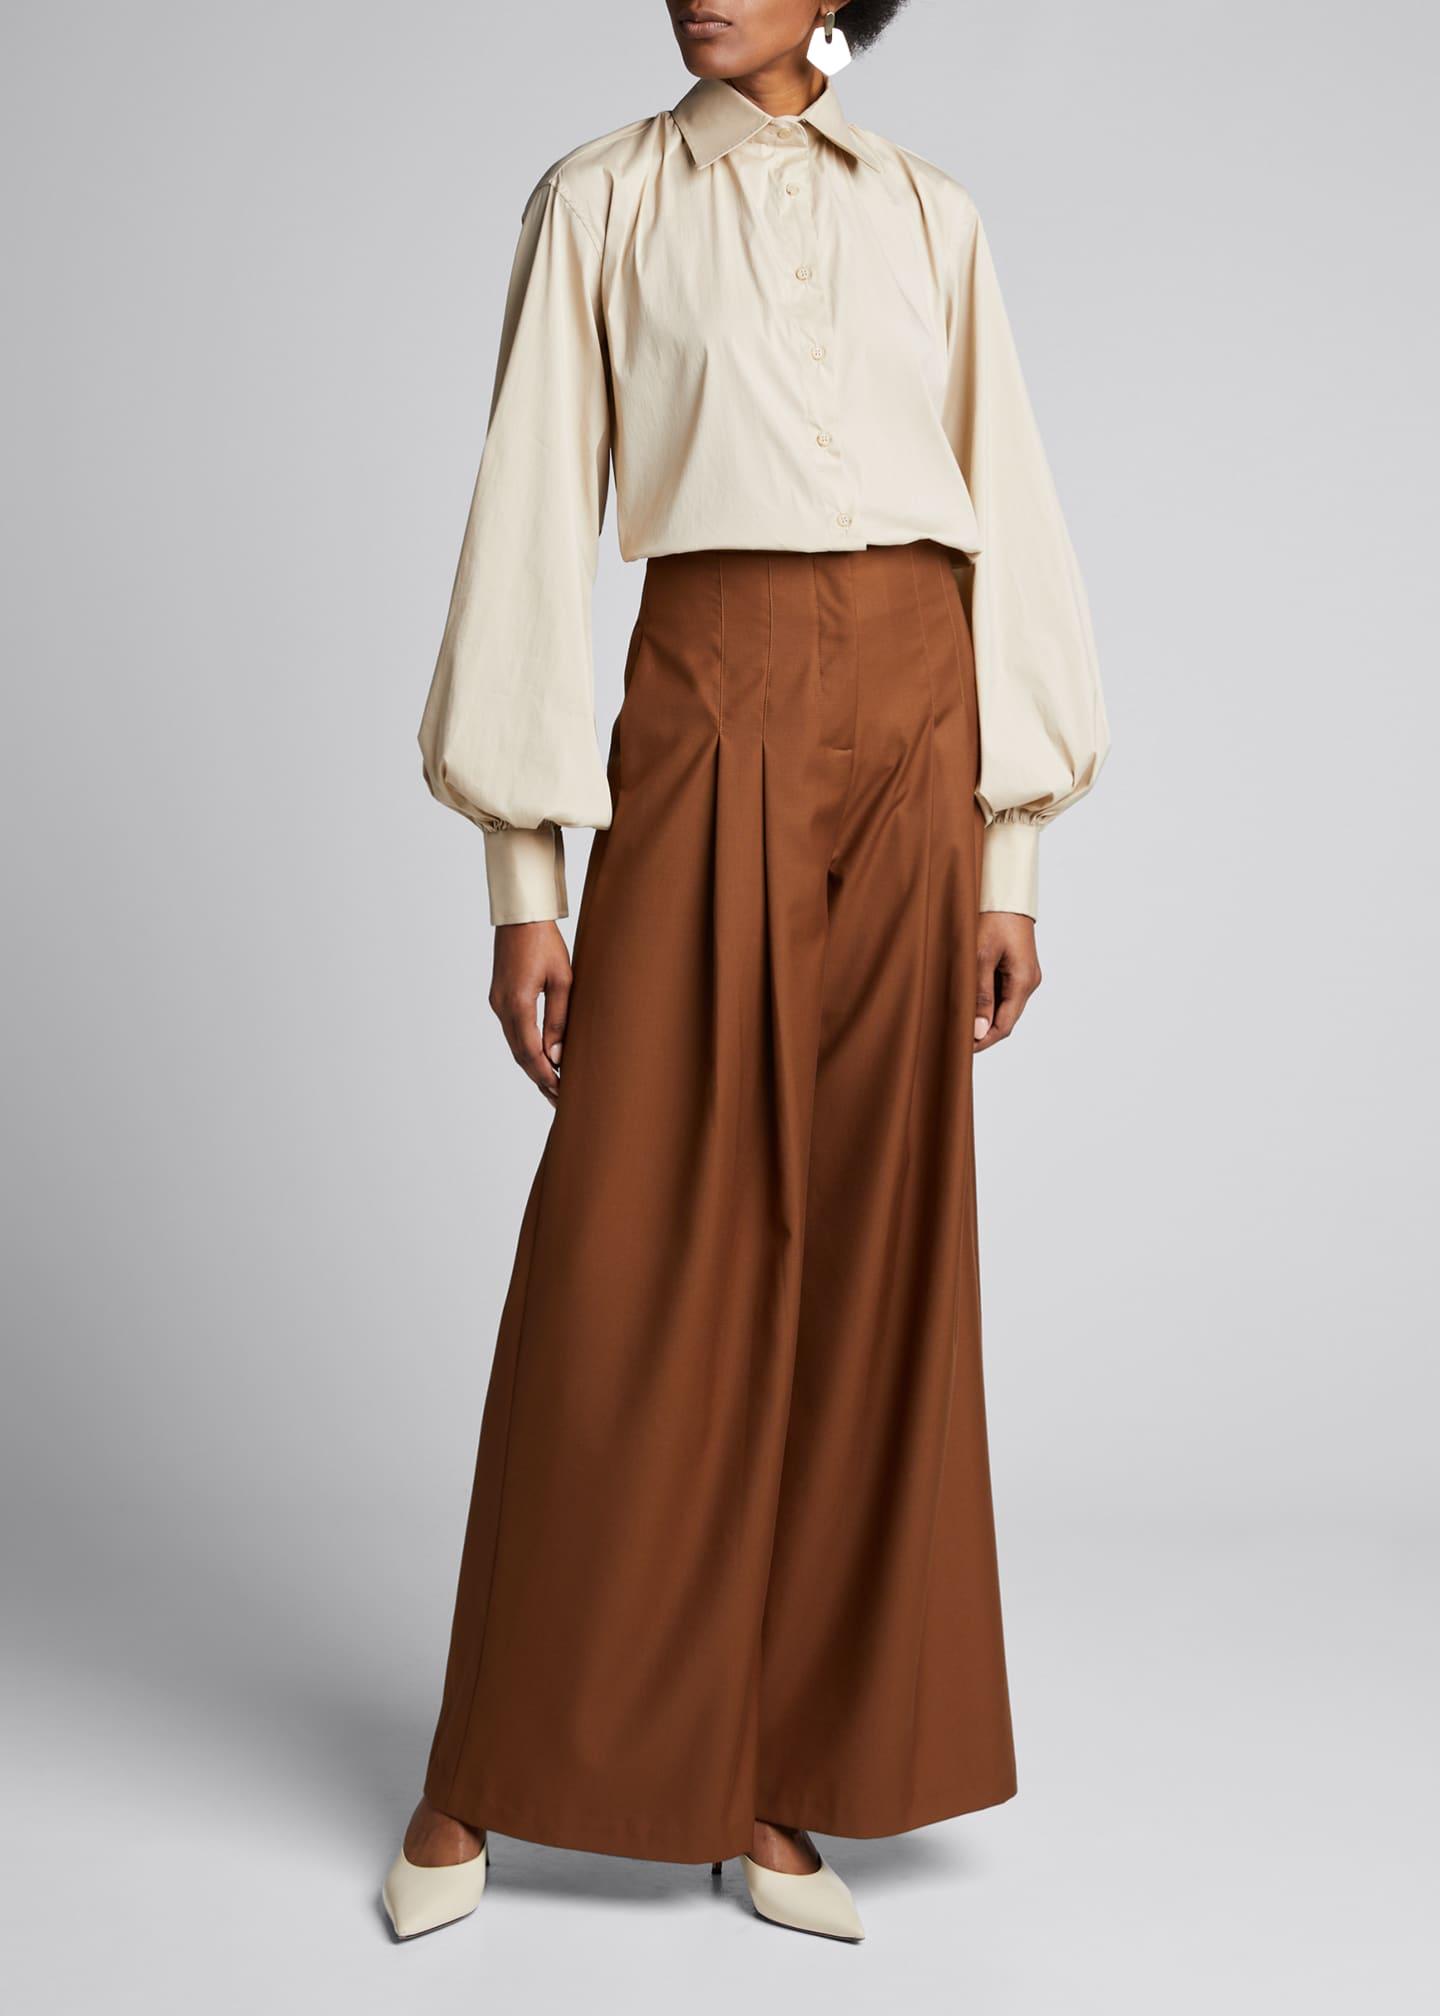 Anna Quan Castiglia Blouson-Sleeve Boxy Shirt